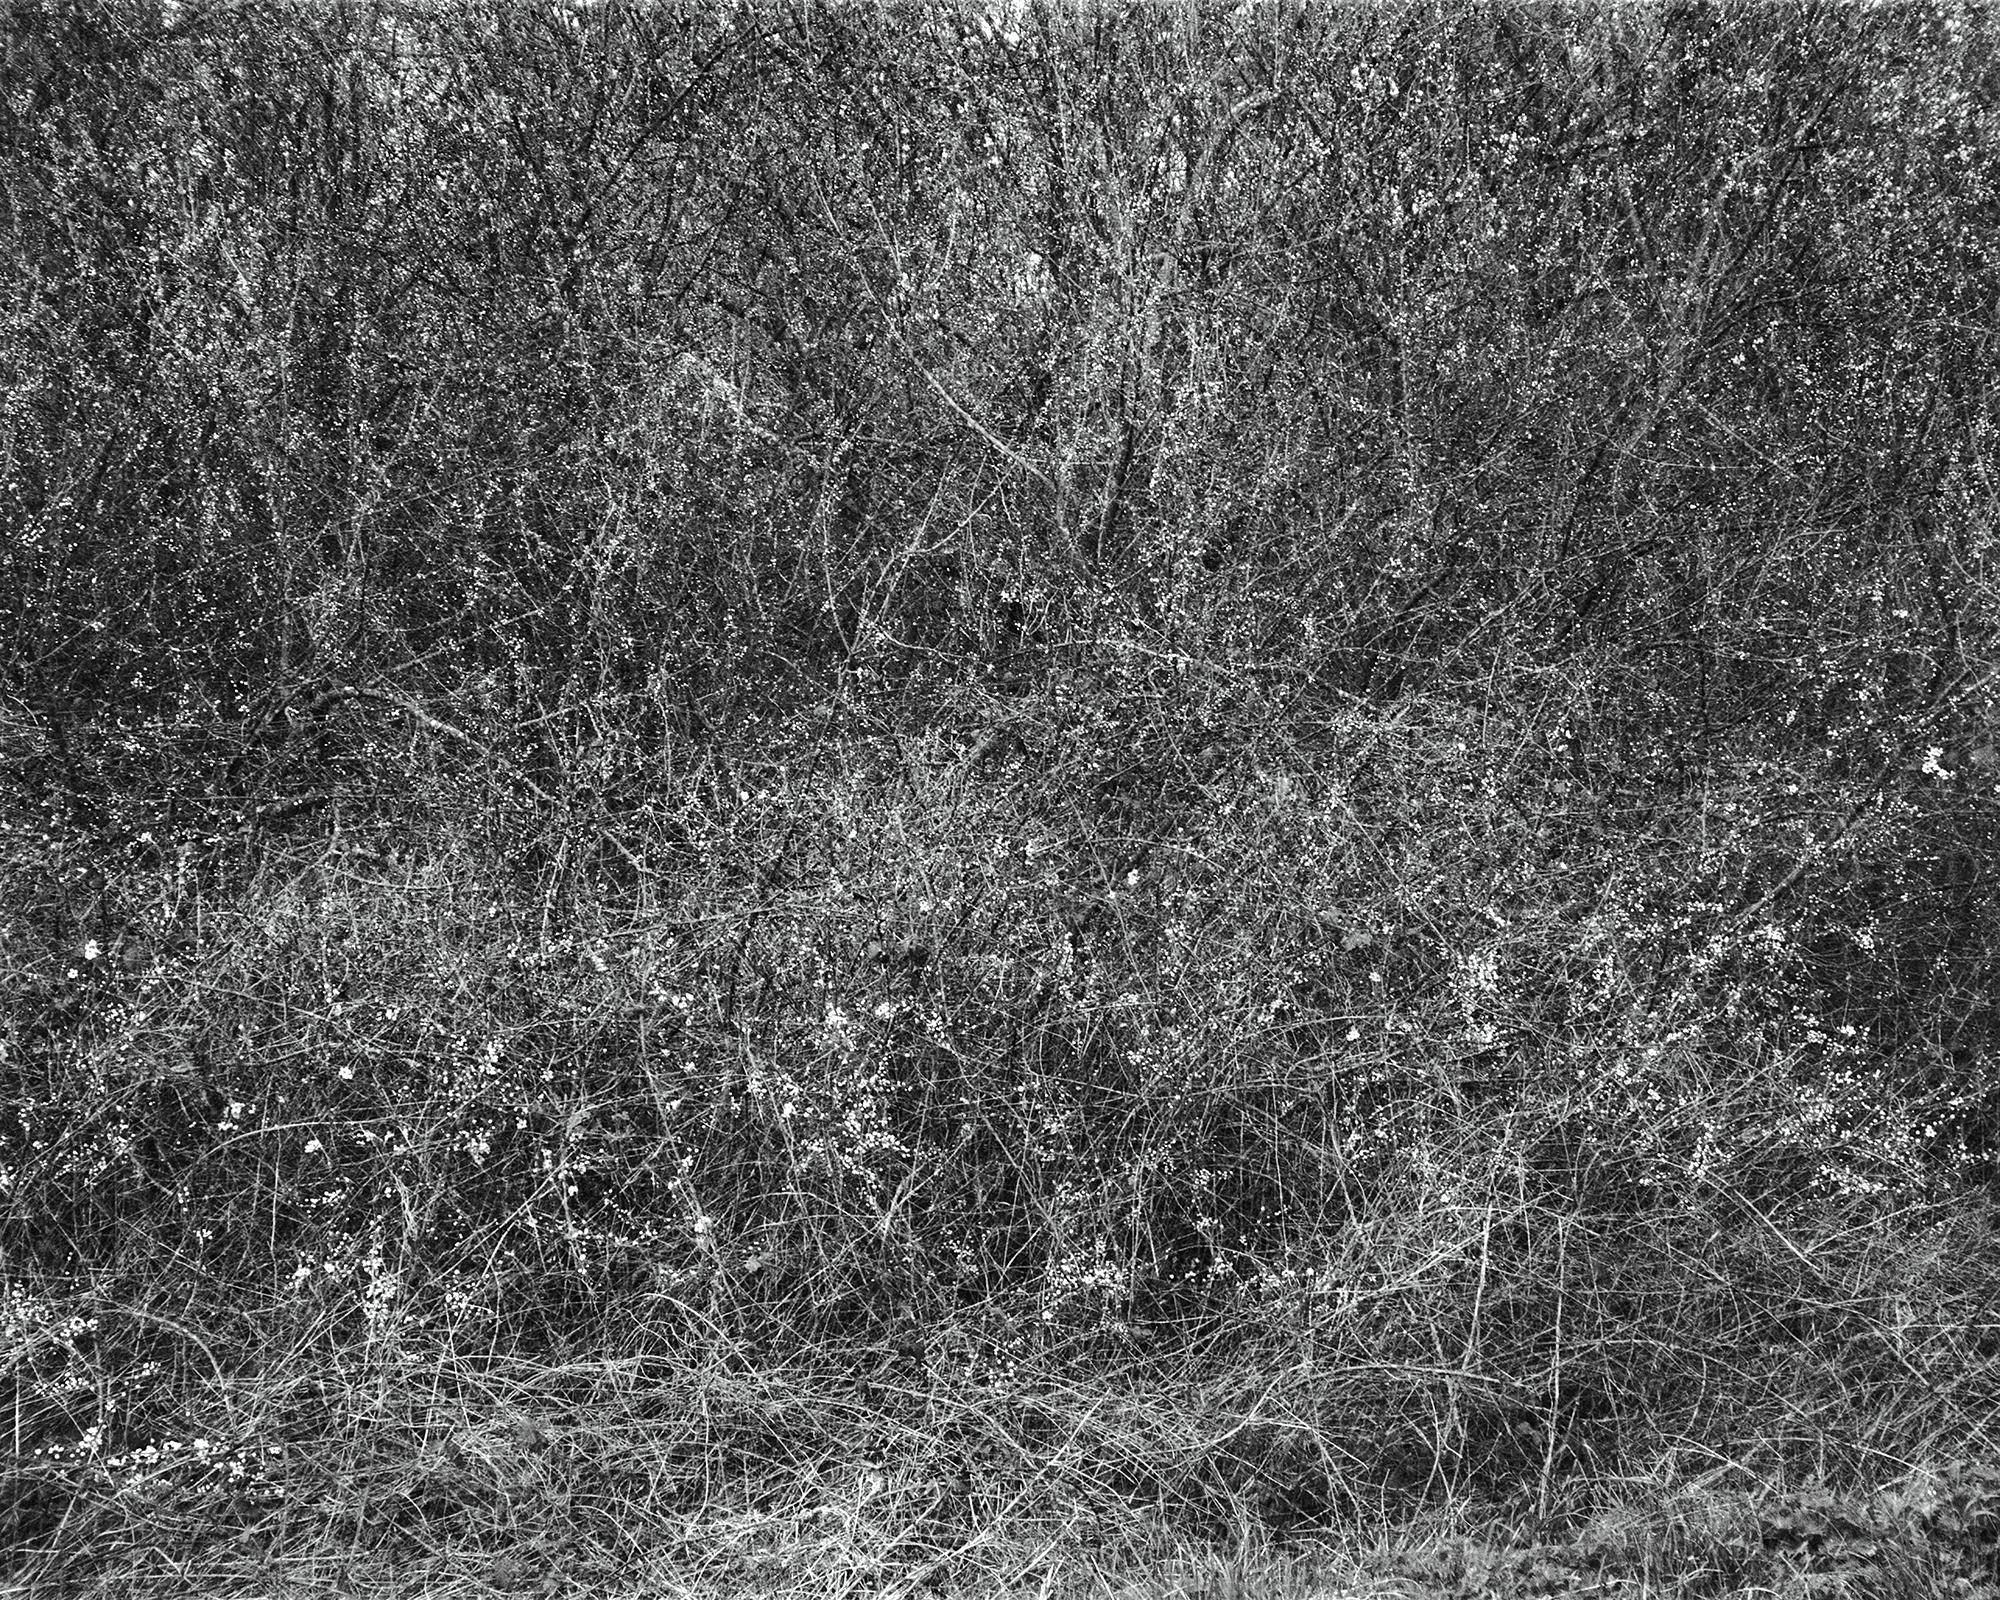 Photograph: Jonty Sale, 'SEMBLANCE #999'